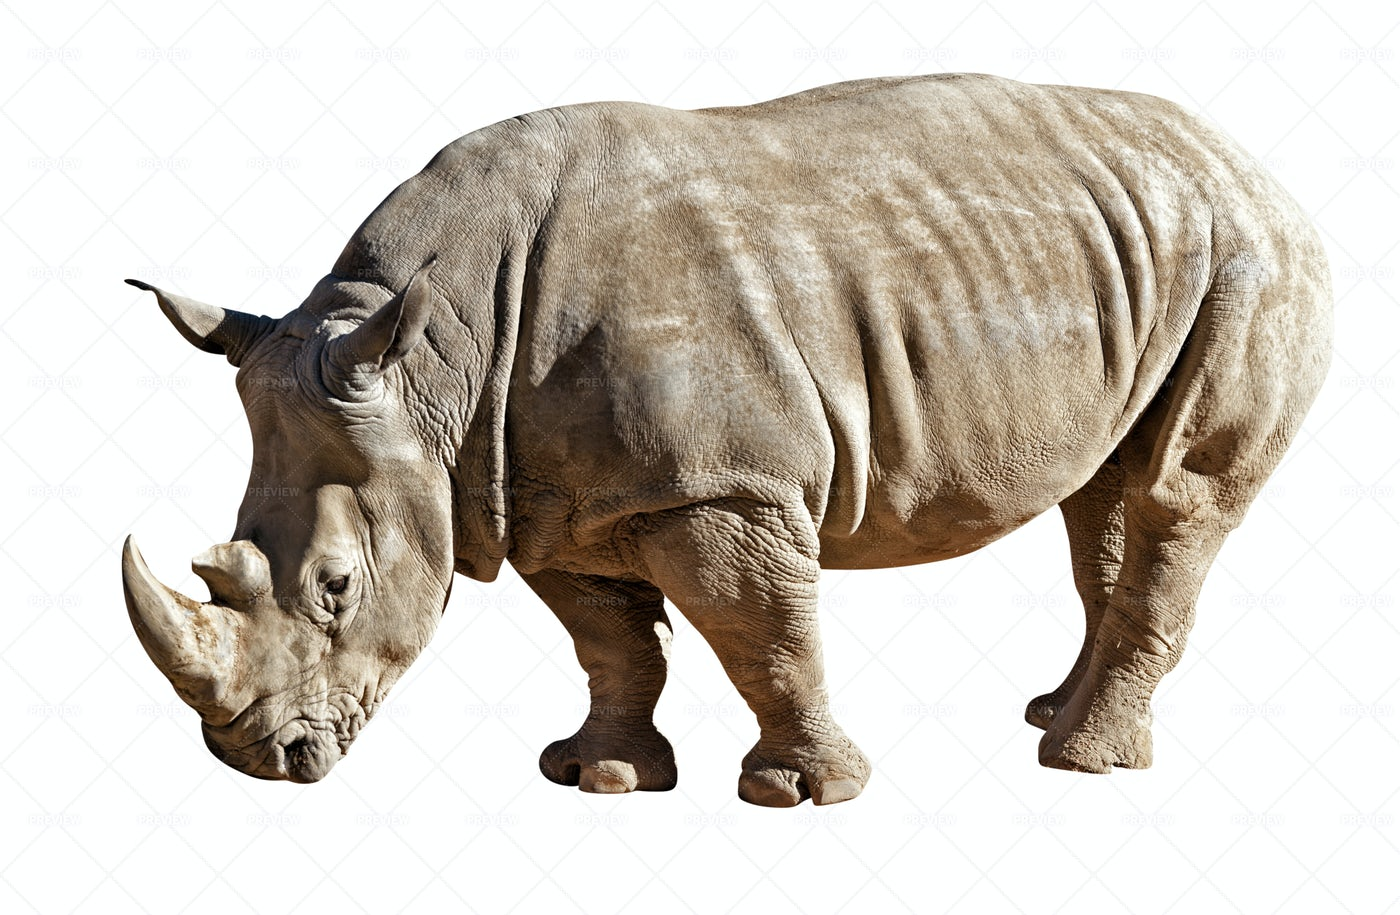 Rhinoceros Isolated On White: Stock Photos